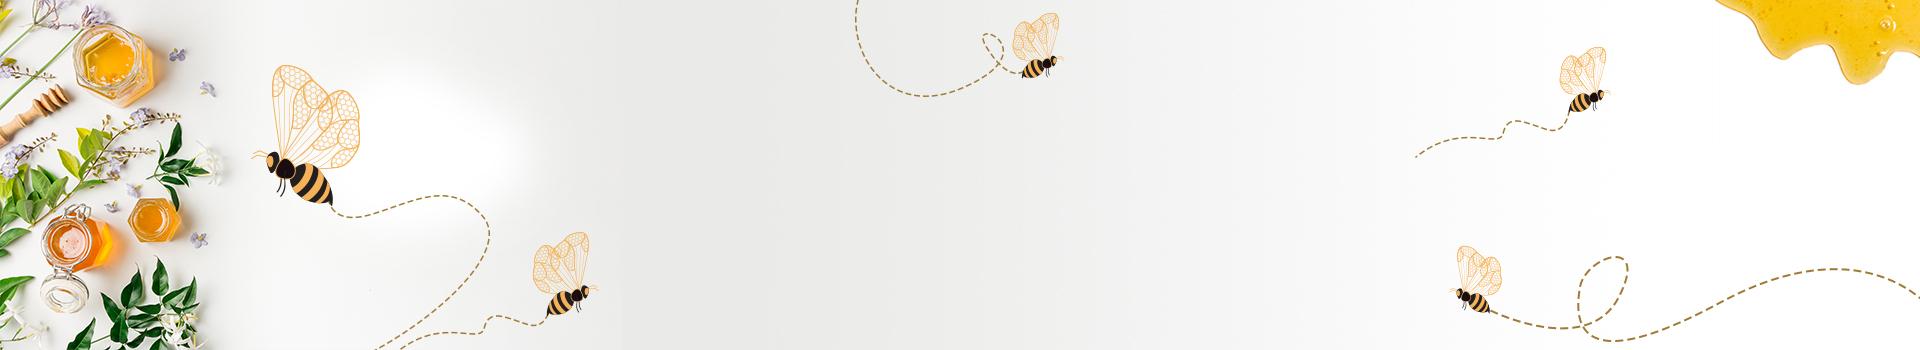 True Honey production - Geohoney